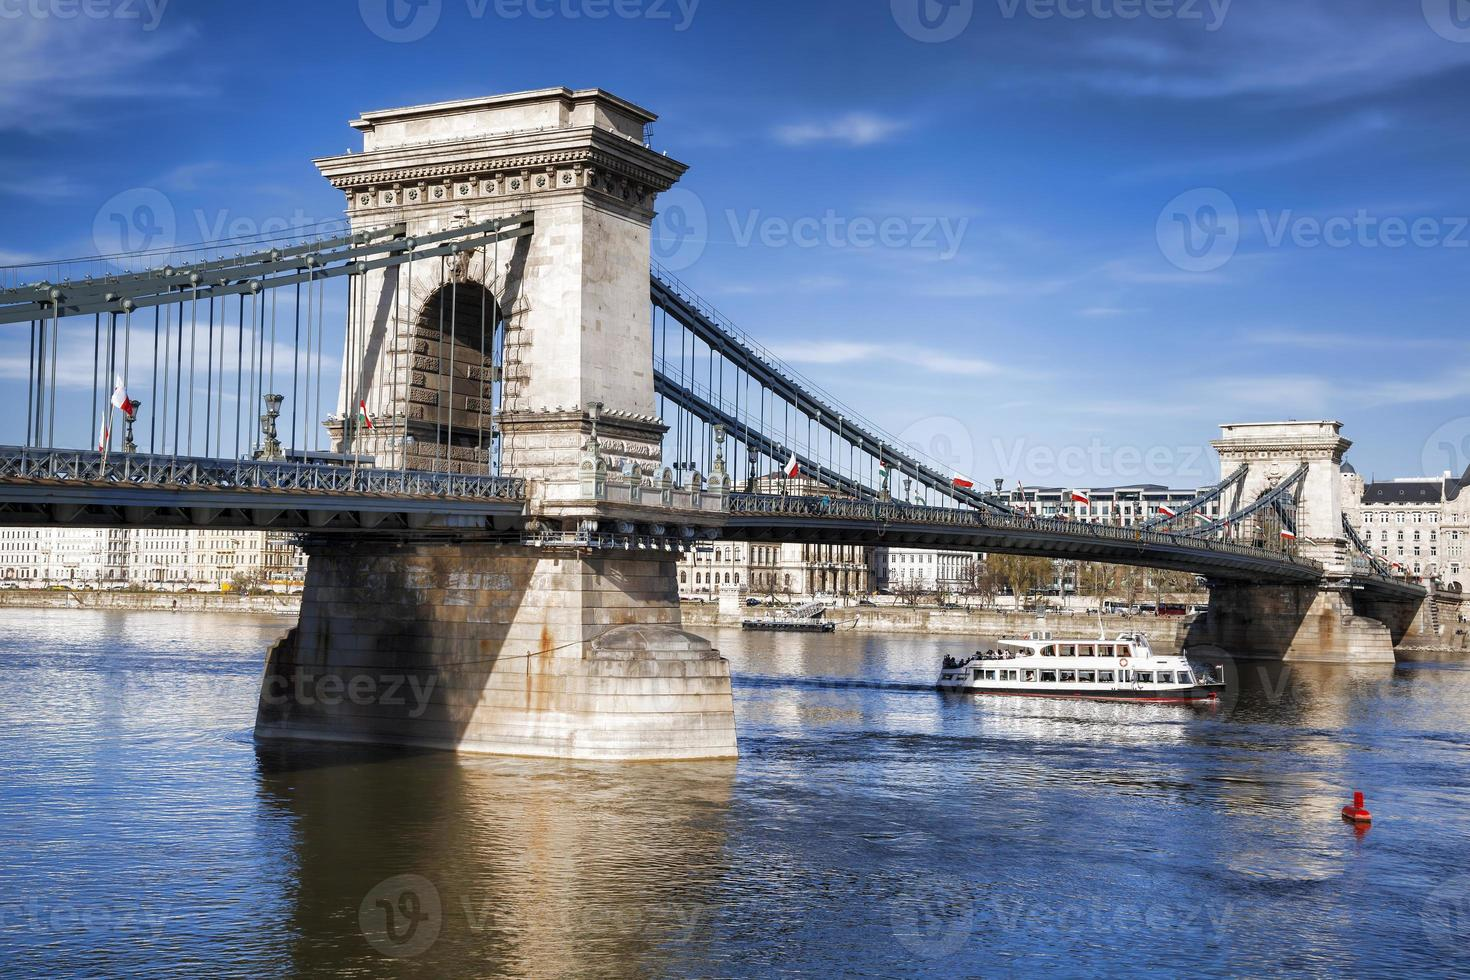 berühmte Kettenbrücke in Budapest, Ungarn foto